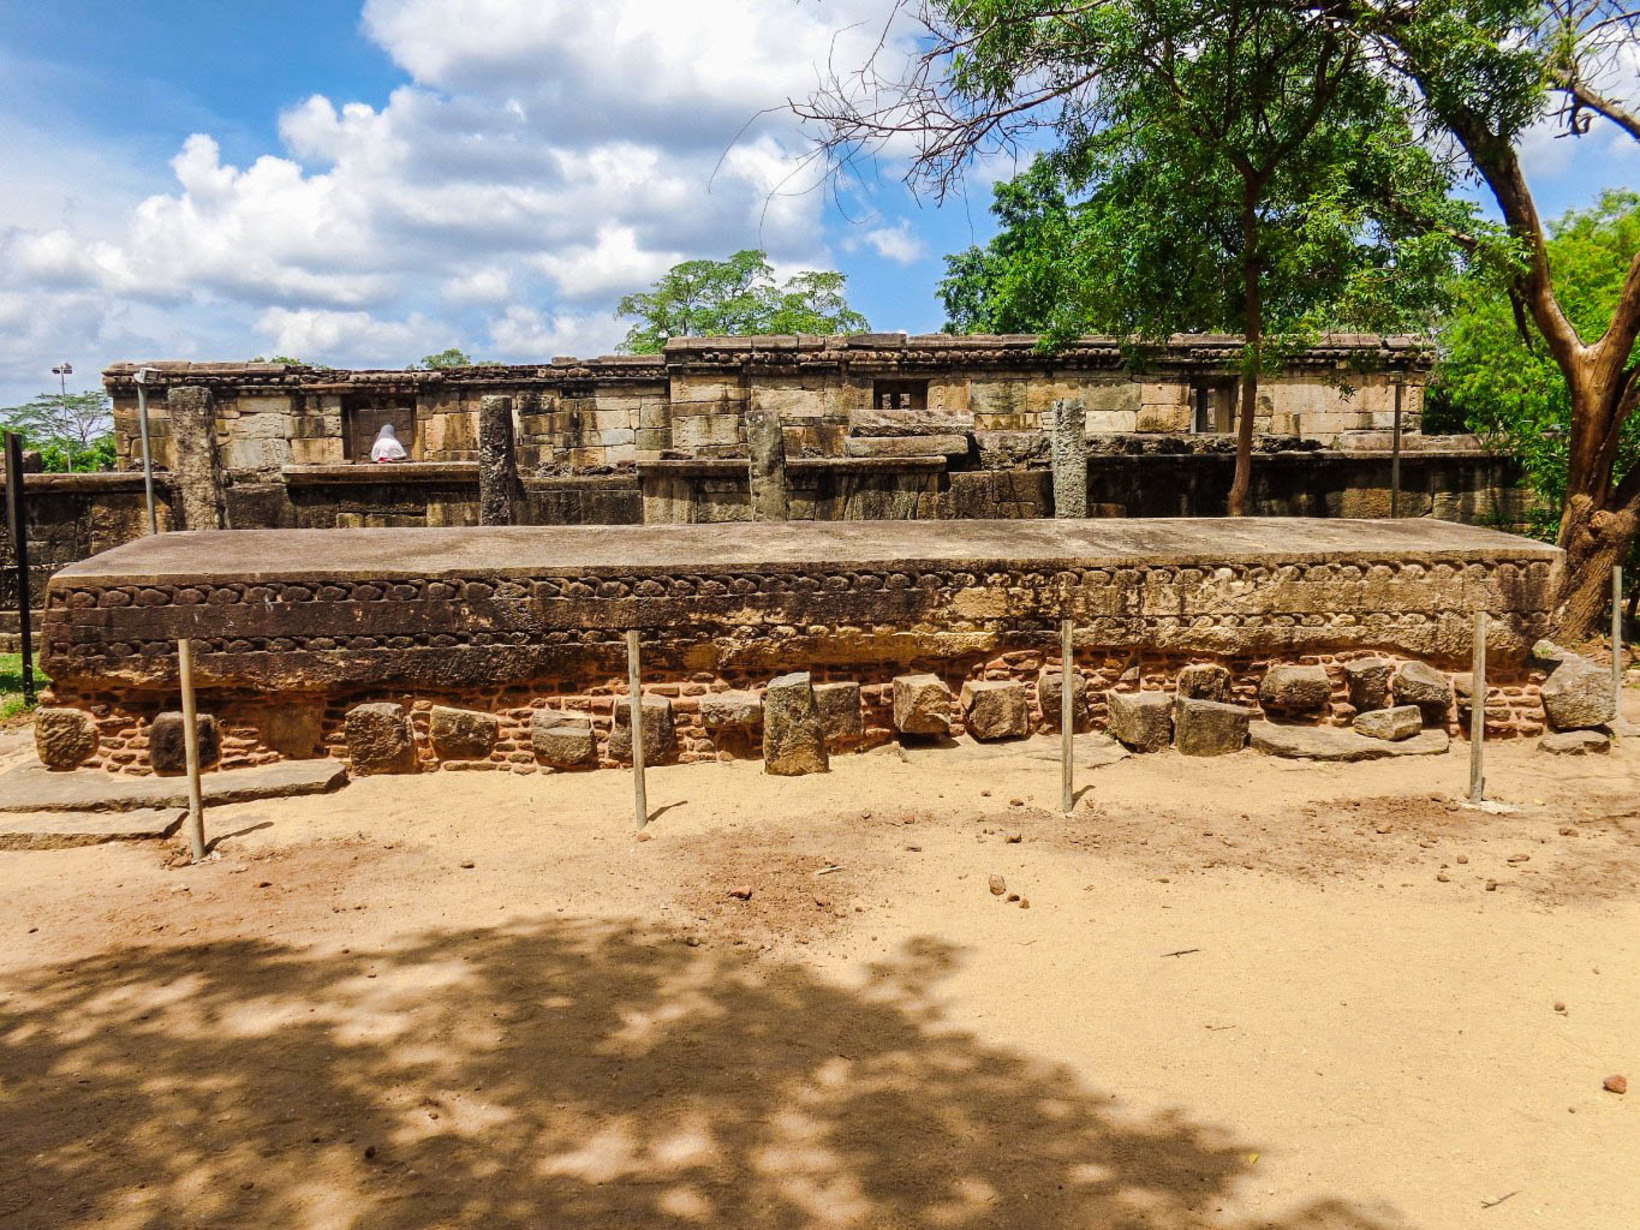 Gal Potha stone inscription (Stone Book) - 49, Polonnaruwa